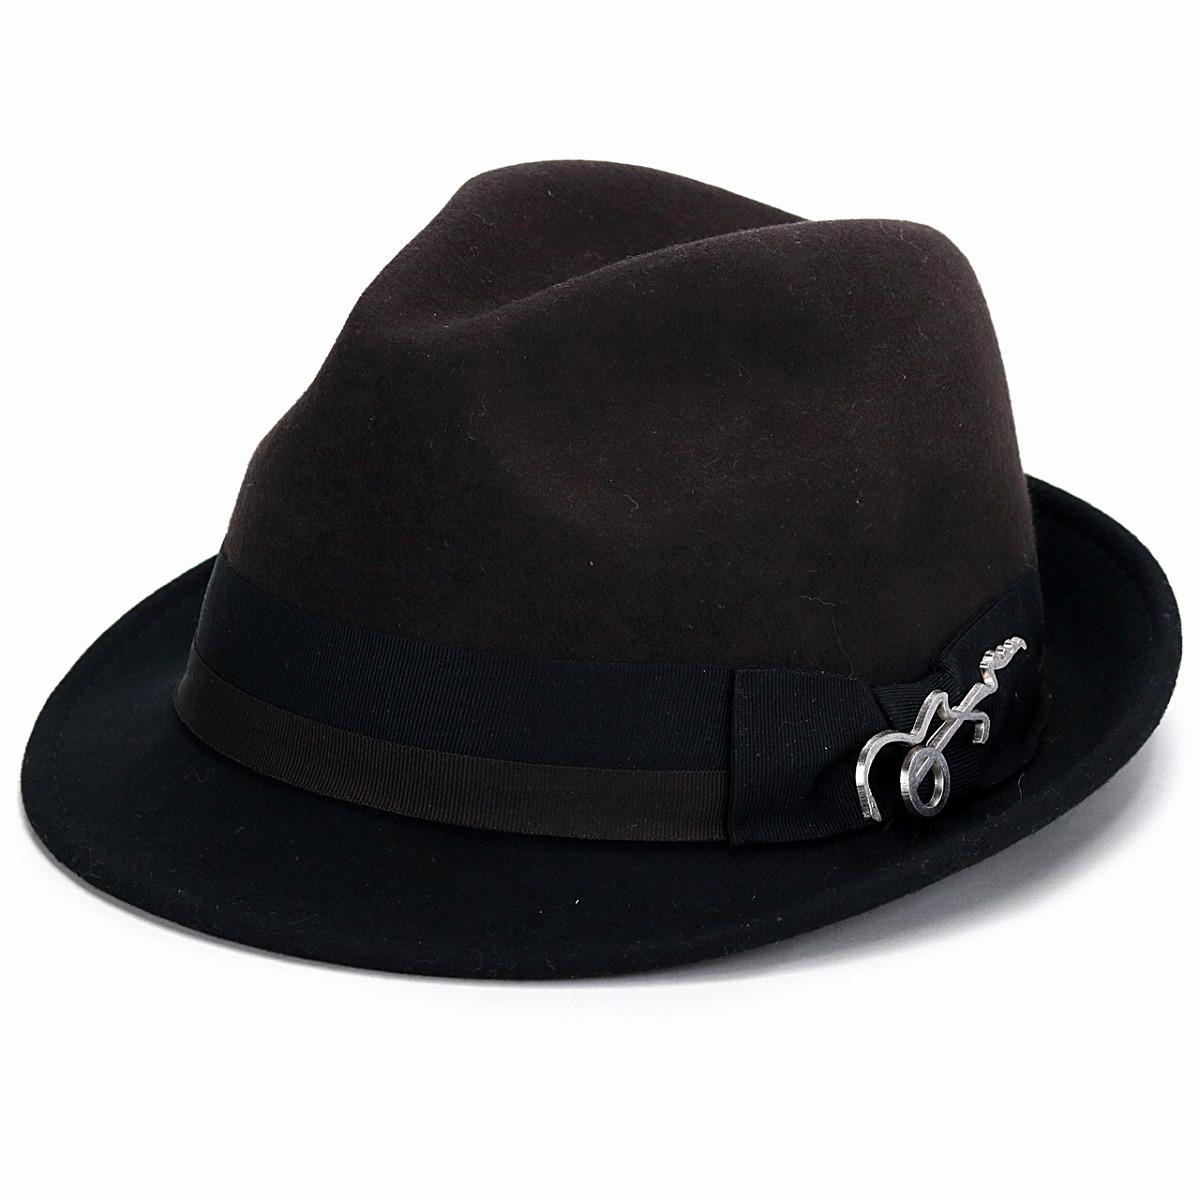 Carlos Santana hat men felt hat Shin pull Carlos Santana hat 2  トーンショートブリムフェドラ ... d284911316f